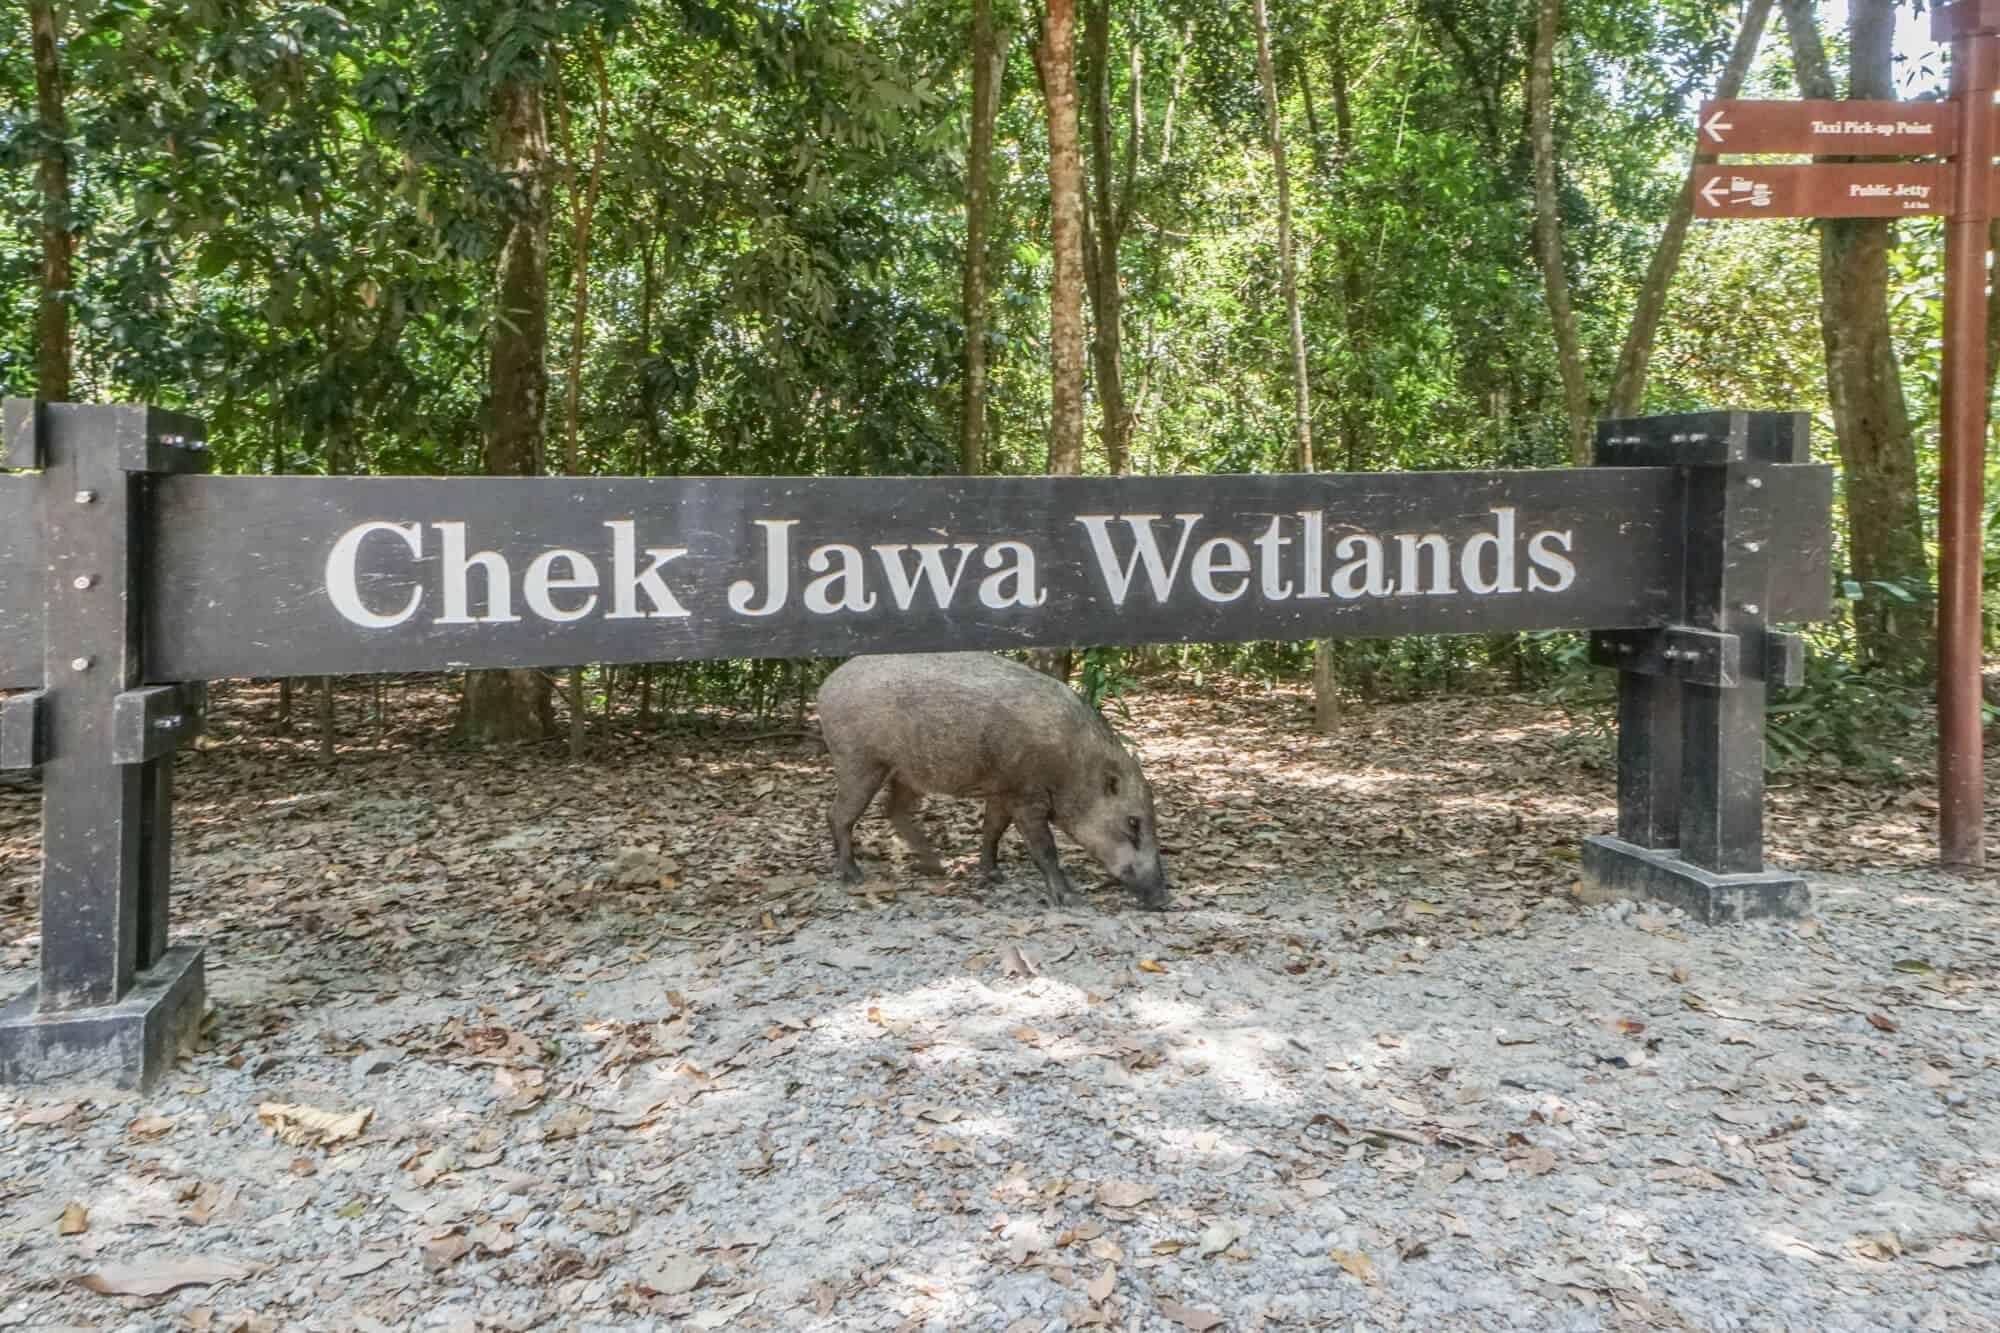 Pulau Ubin Chek Jawa Wetlands